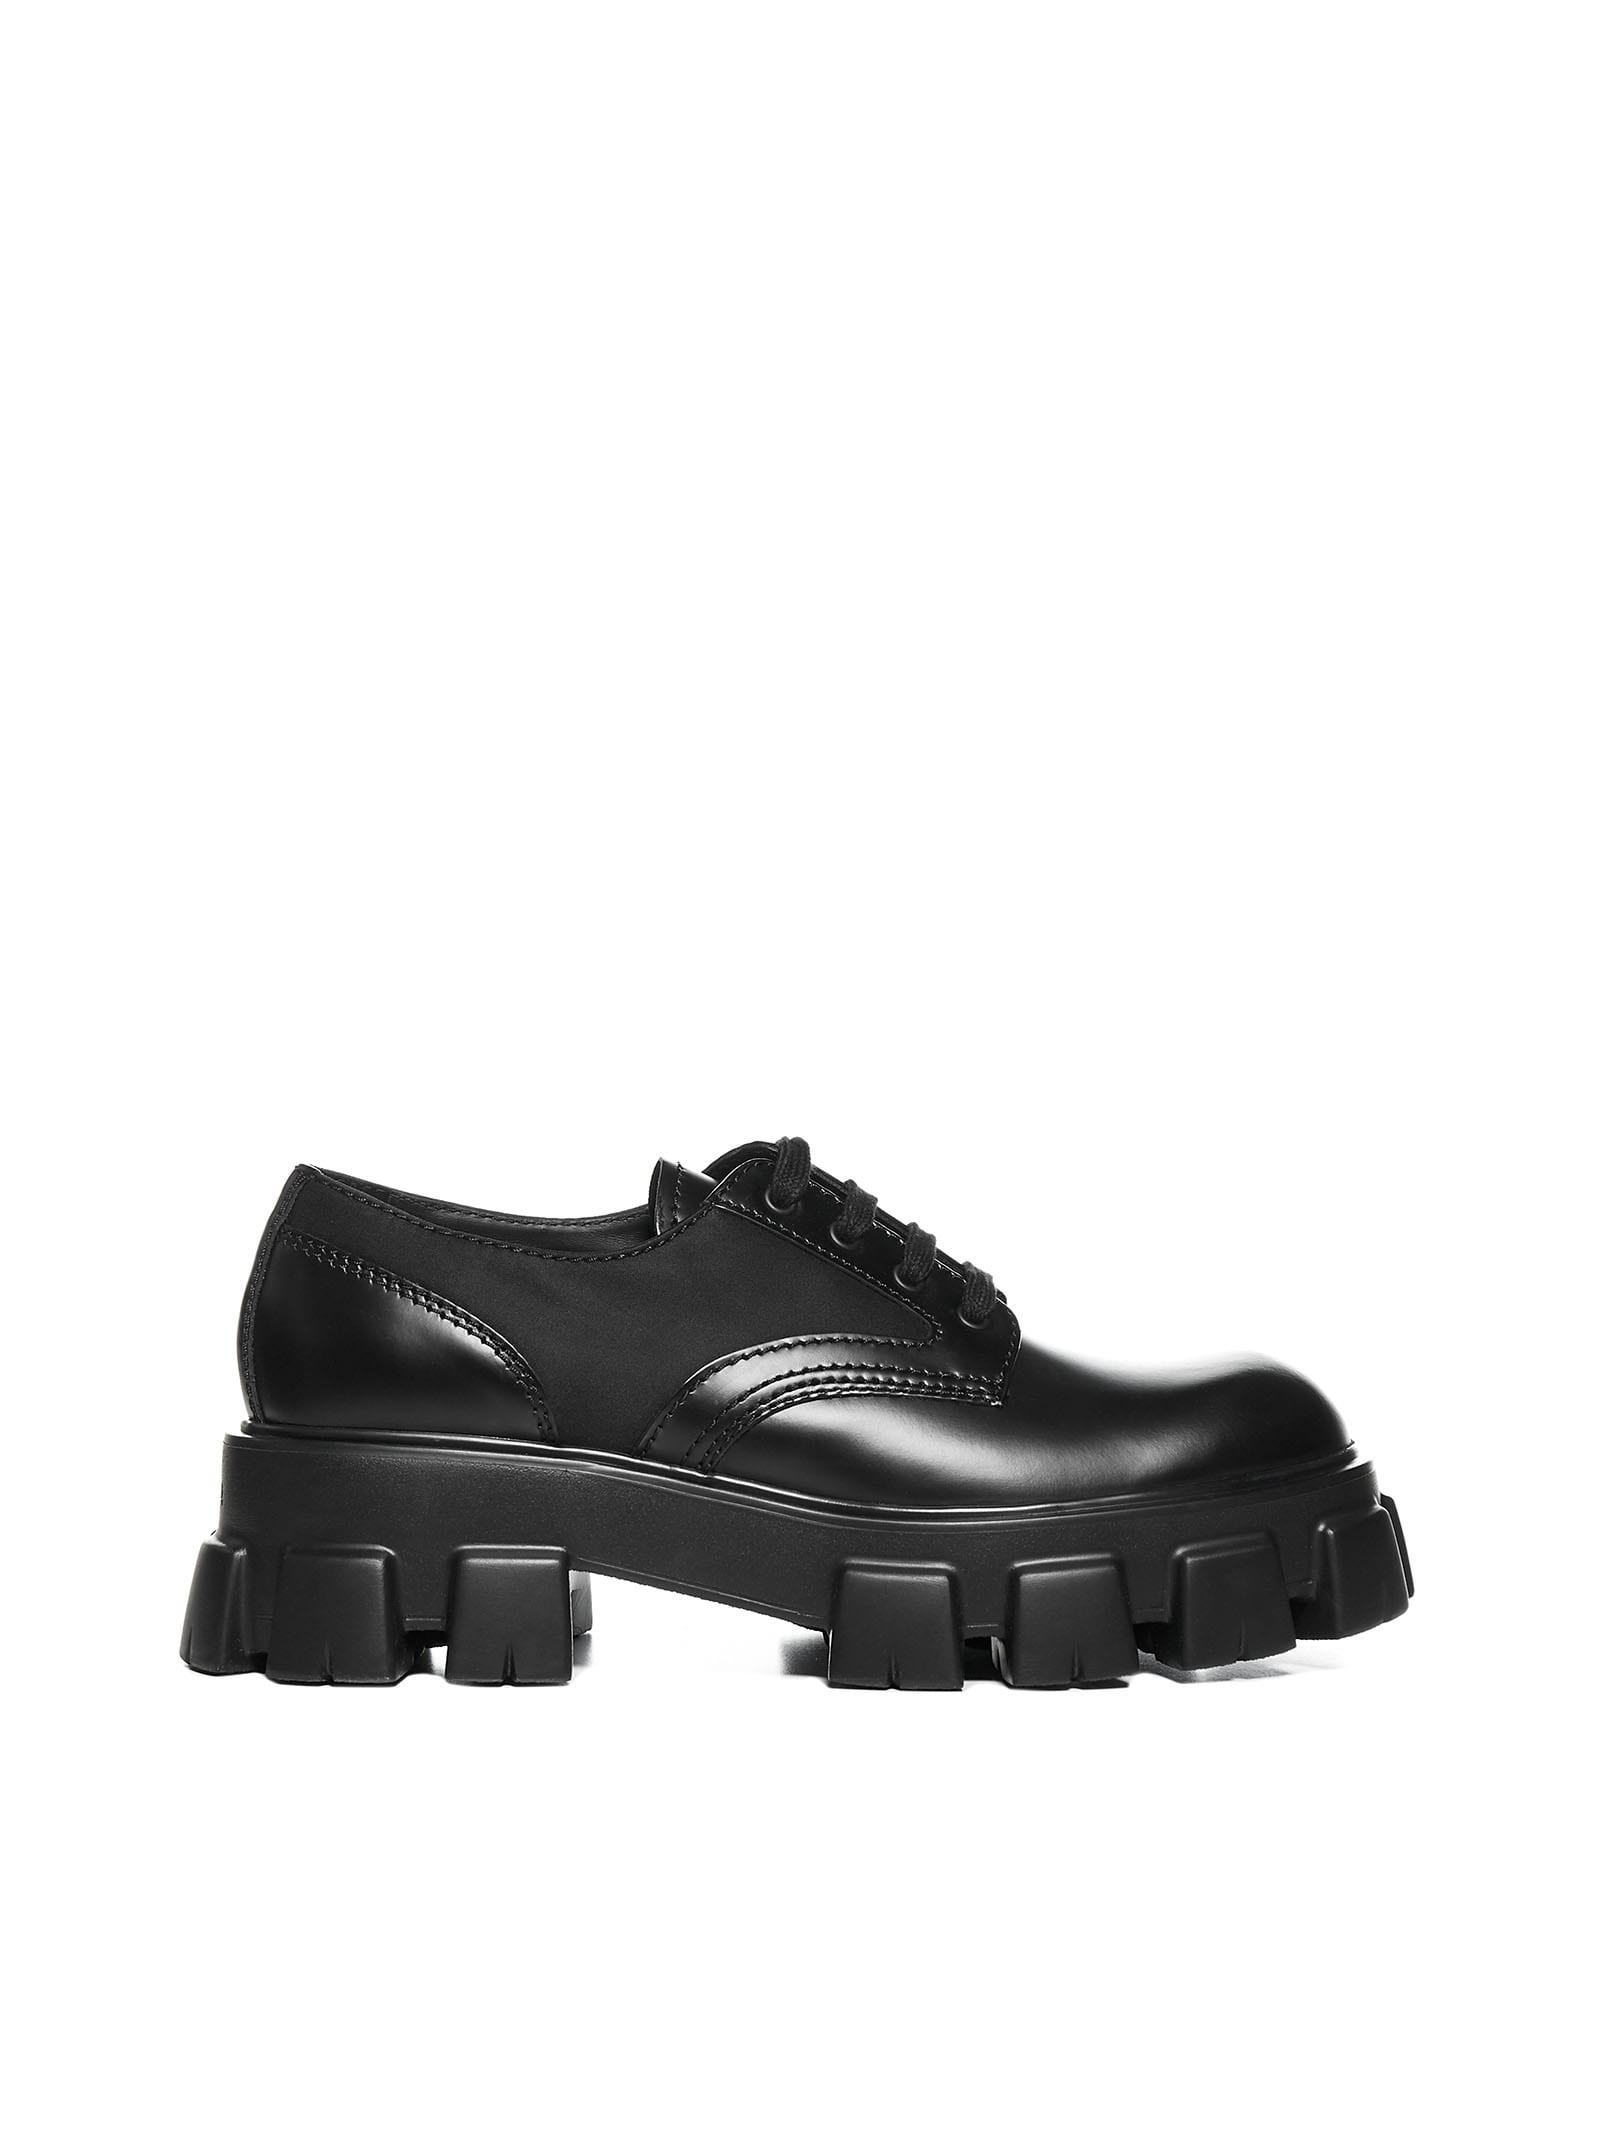 Prada Laced Shoes